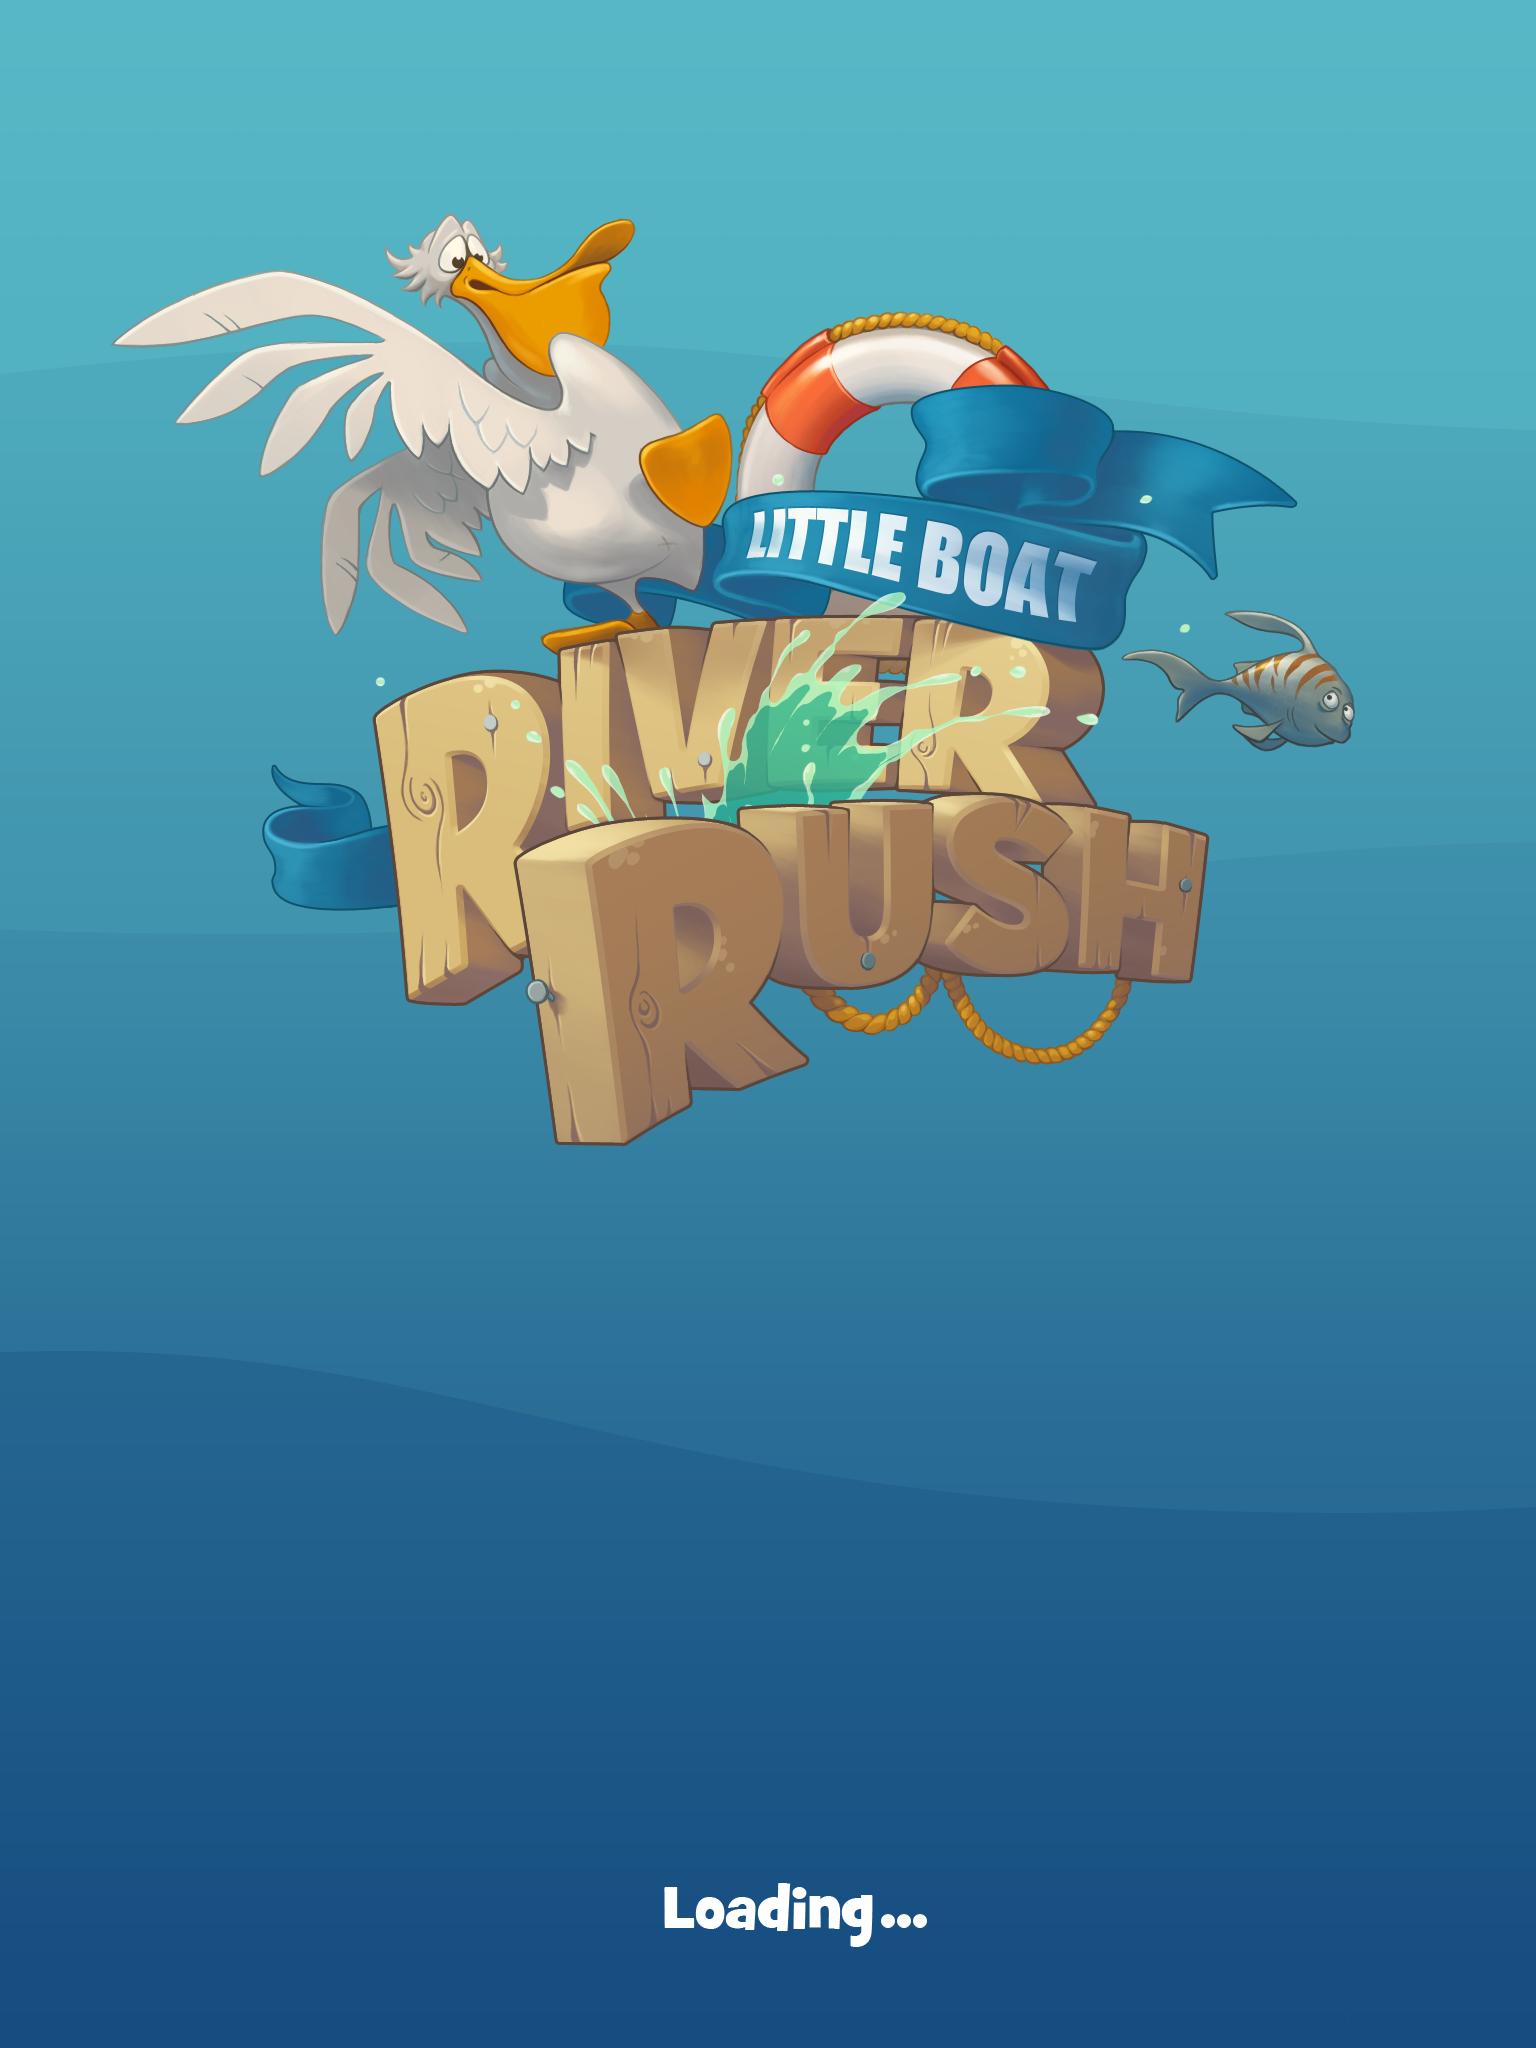 Rr splash